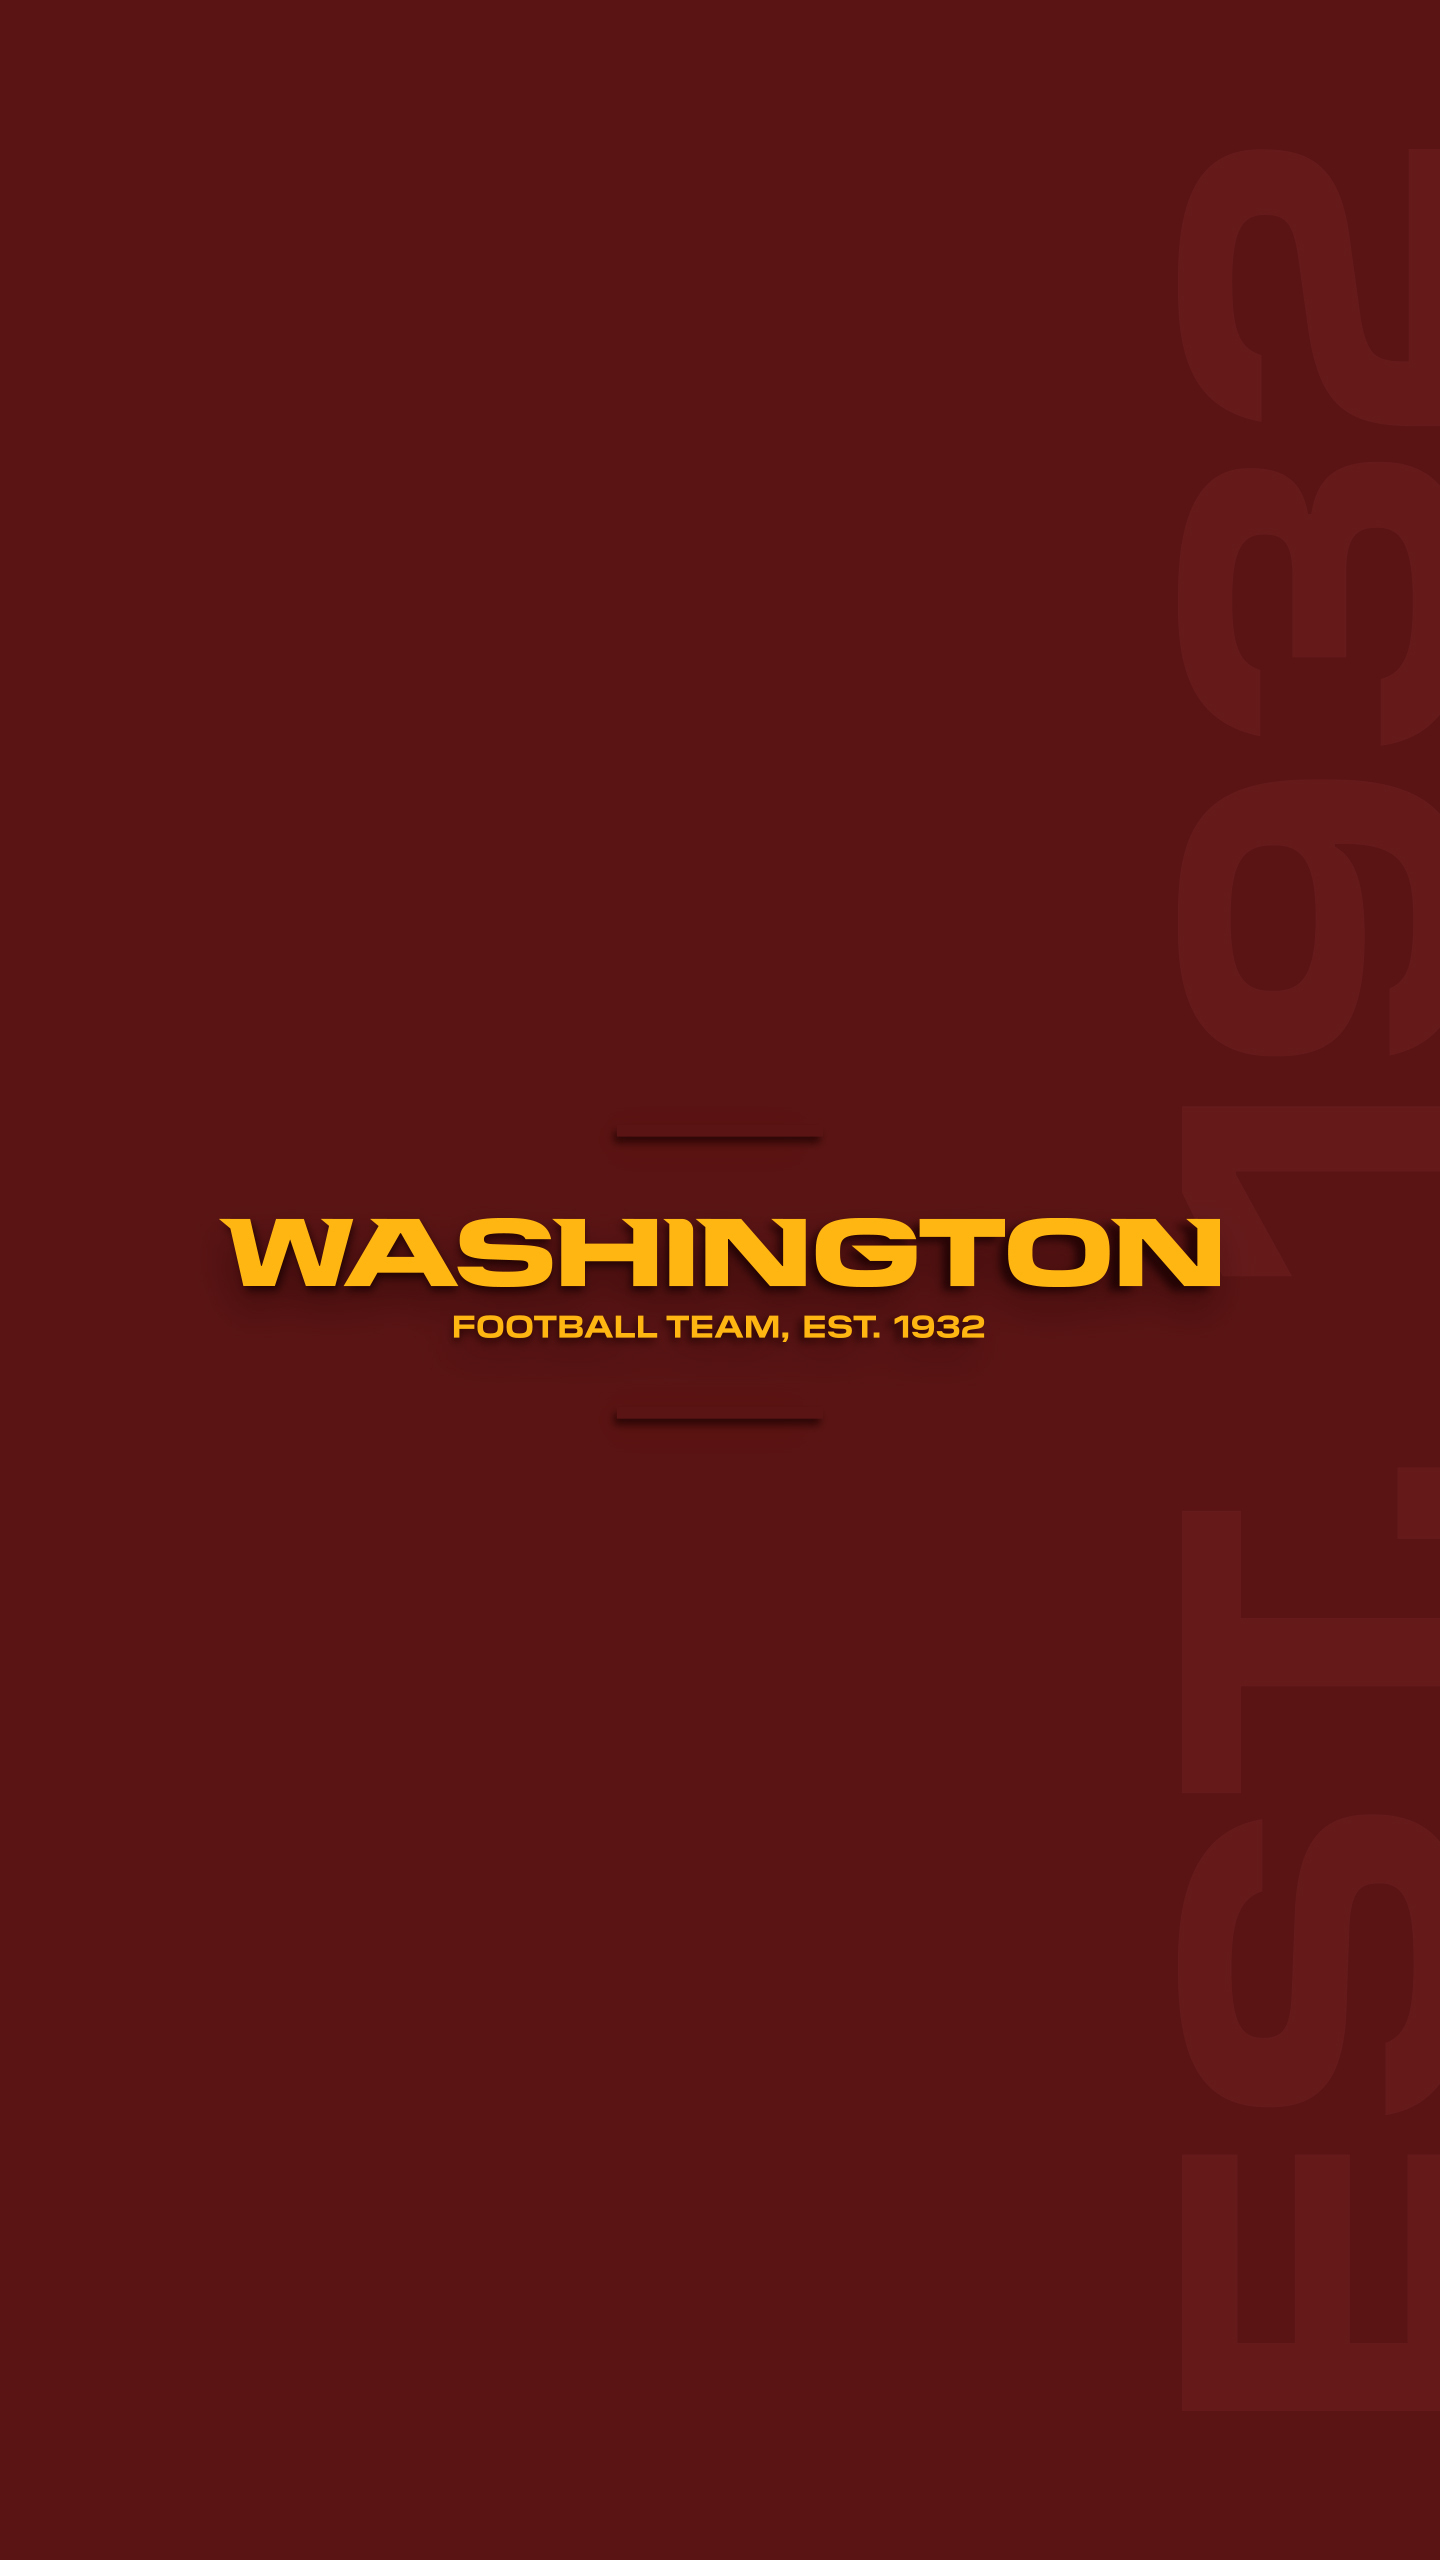 Fan Zone Washington Football Team Washingtonfootball Com